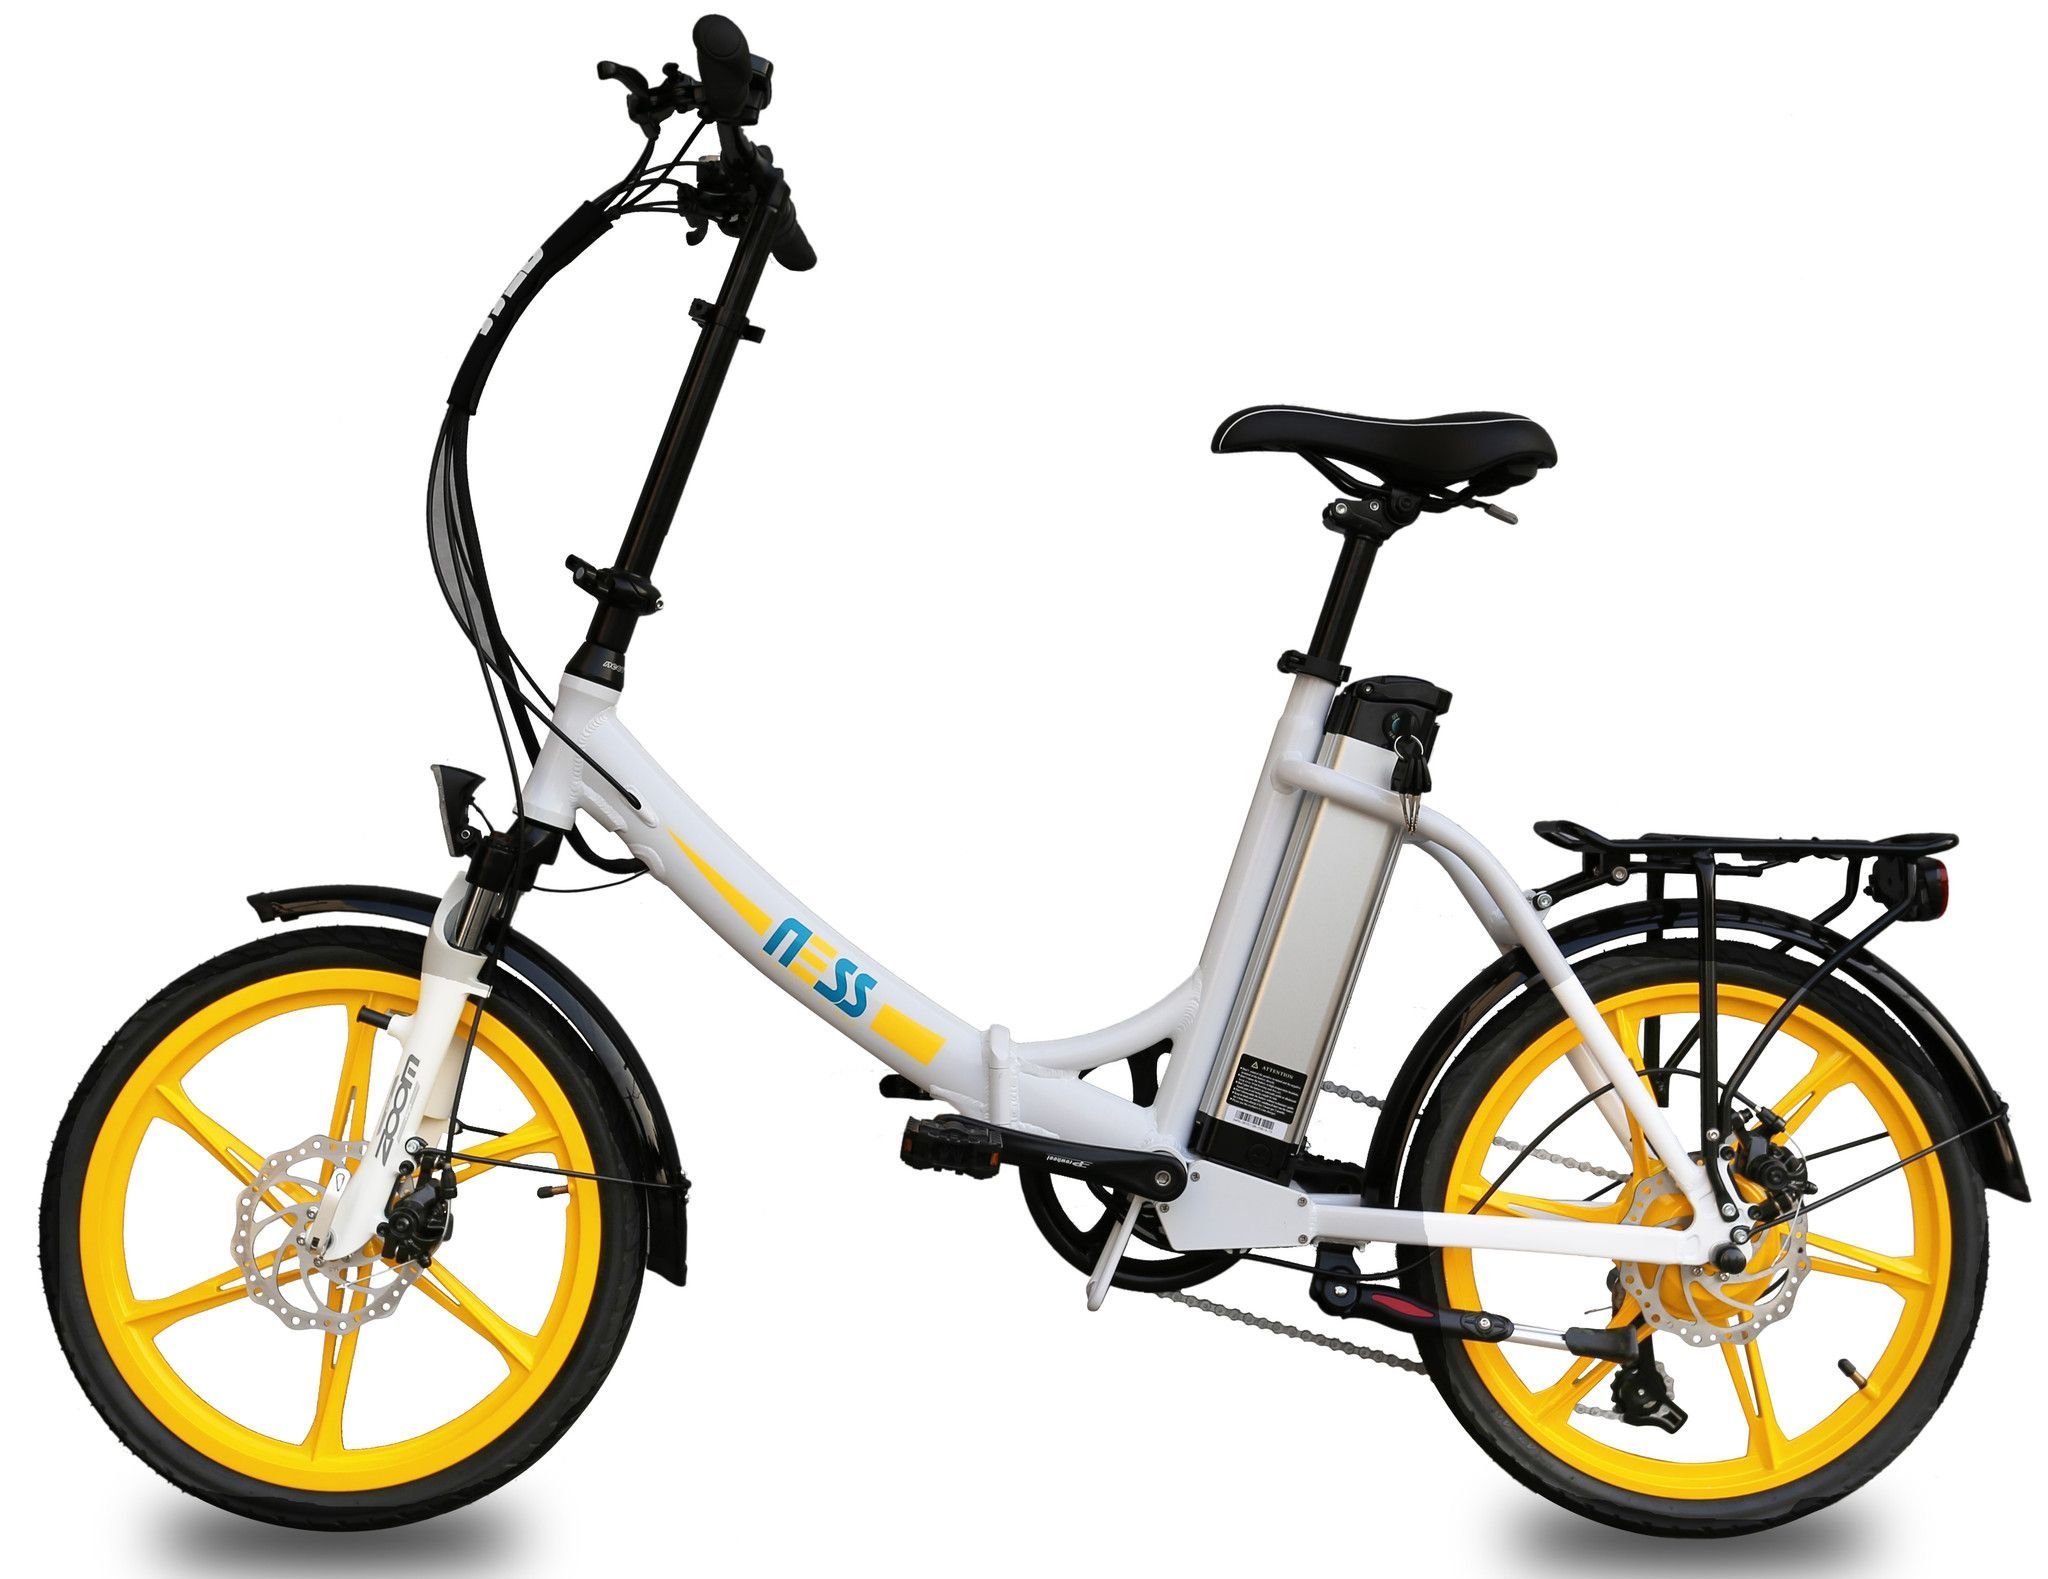 Ness Icon Folding Electric Bike Folding Electric Bike Bike Bicycle